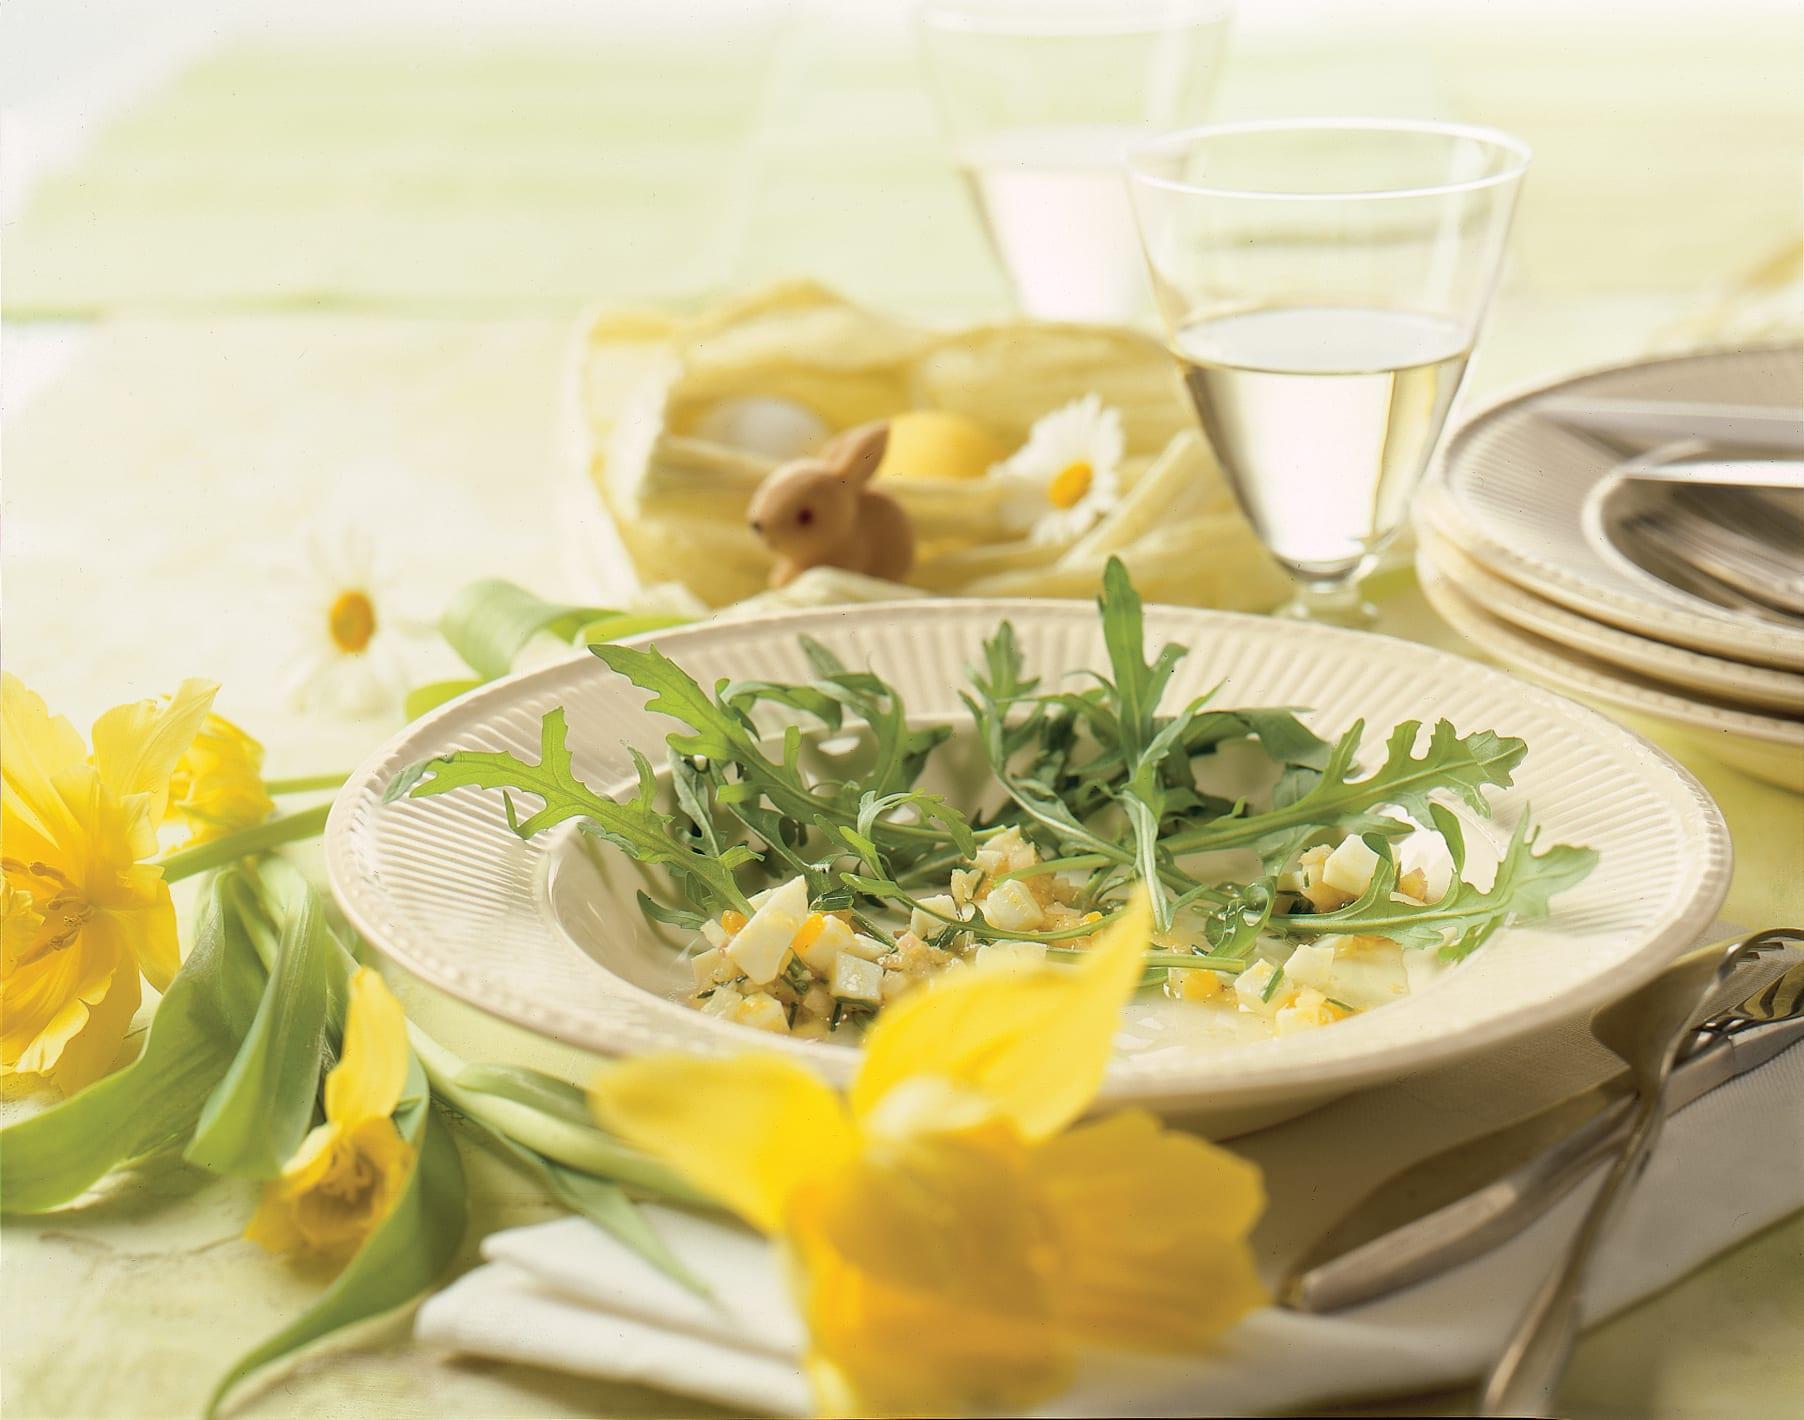 Rucola-Salat mit Eier-Zitronen-Vinaigrette